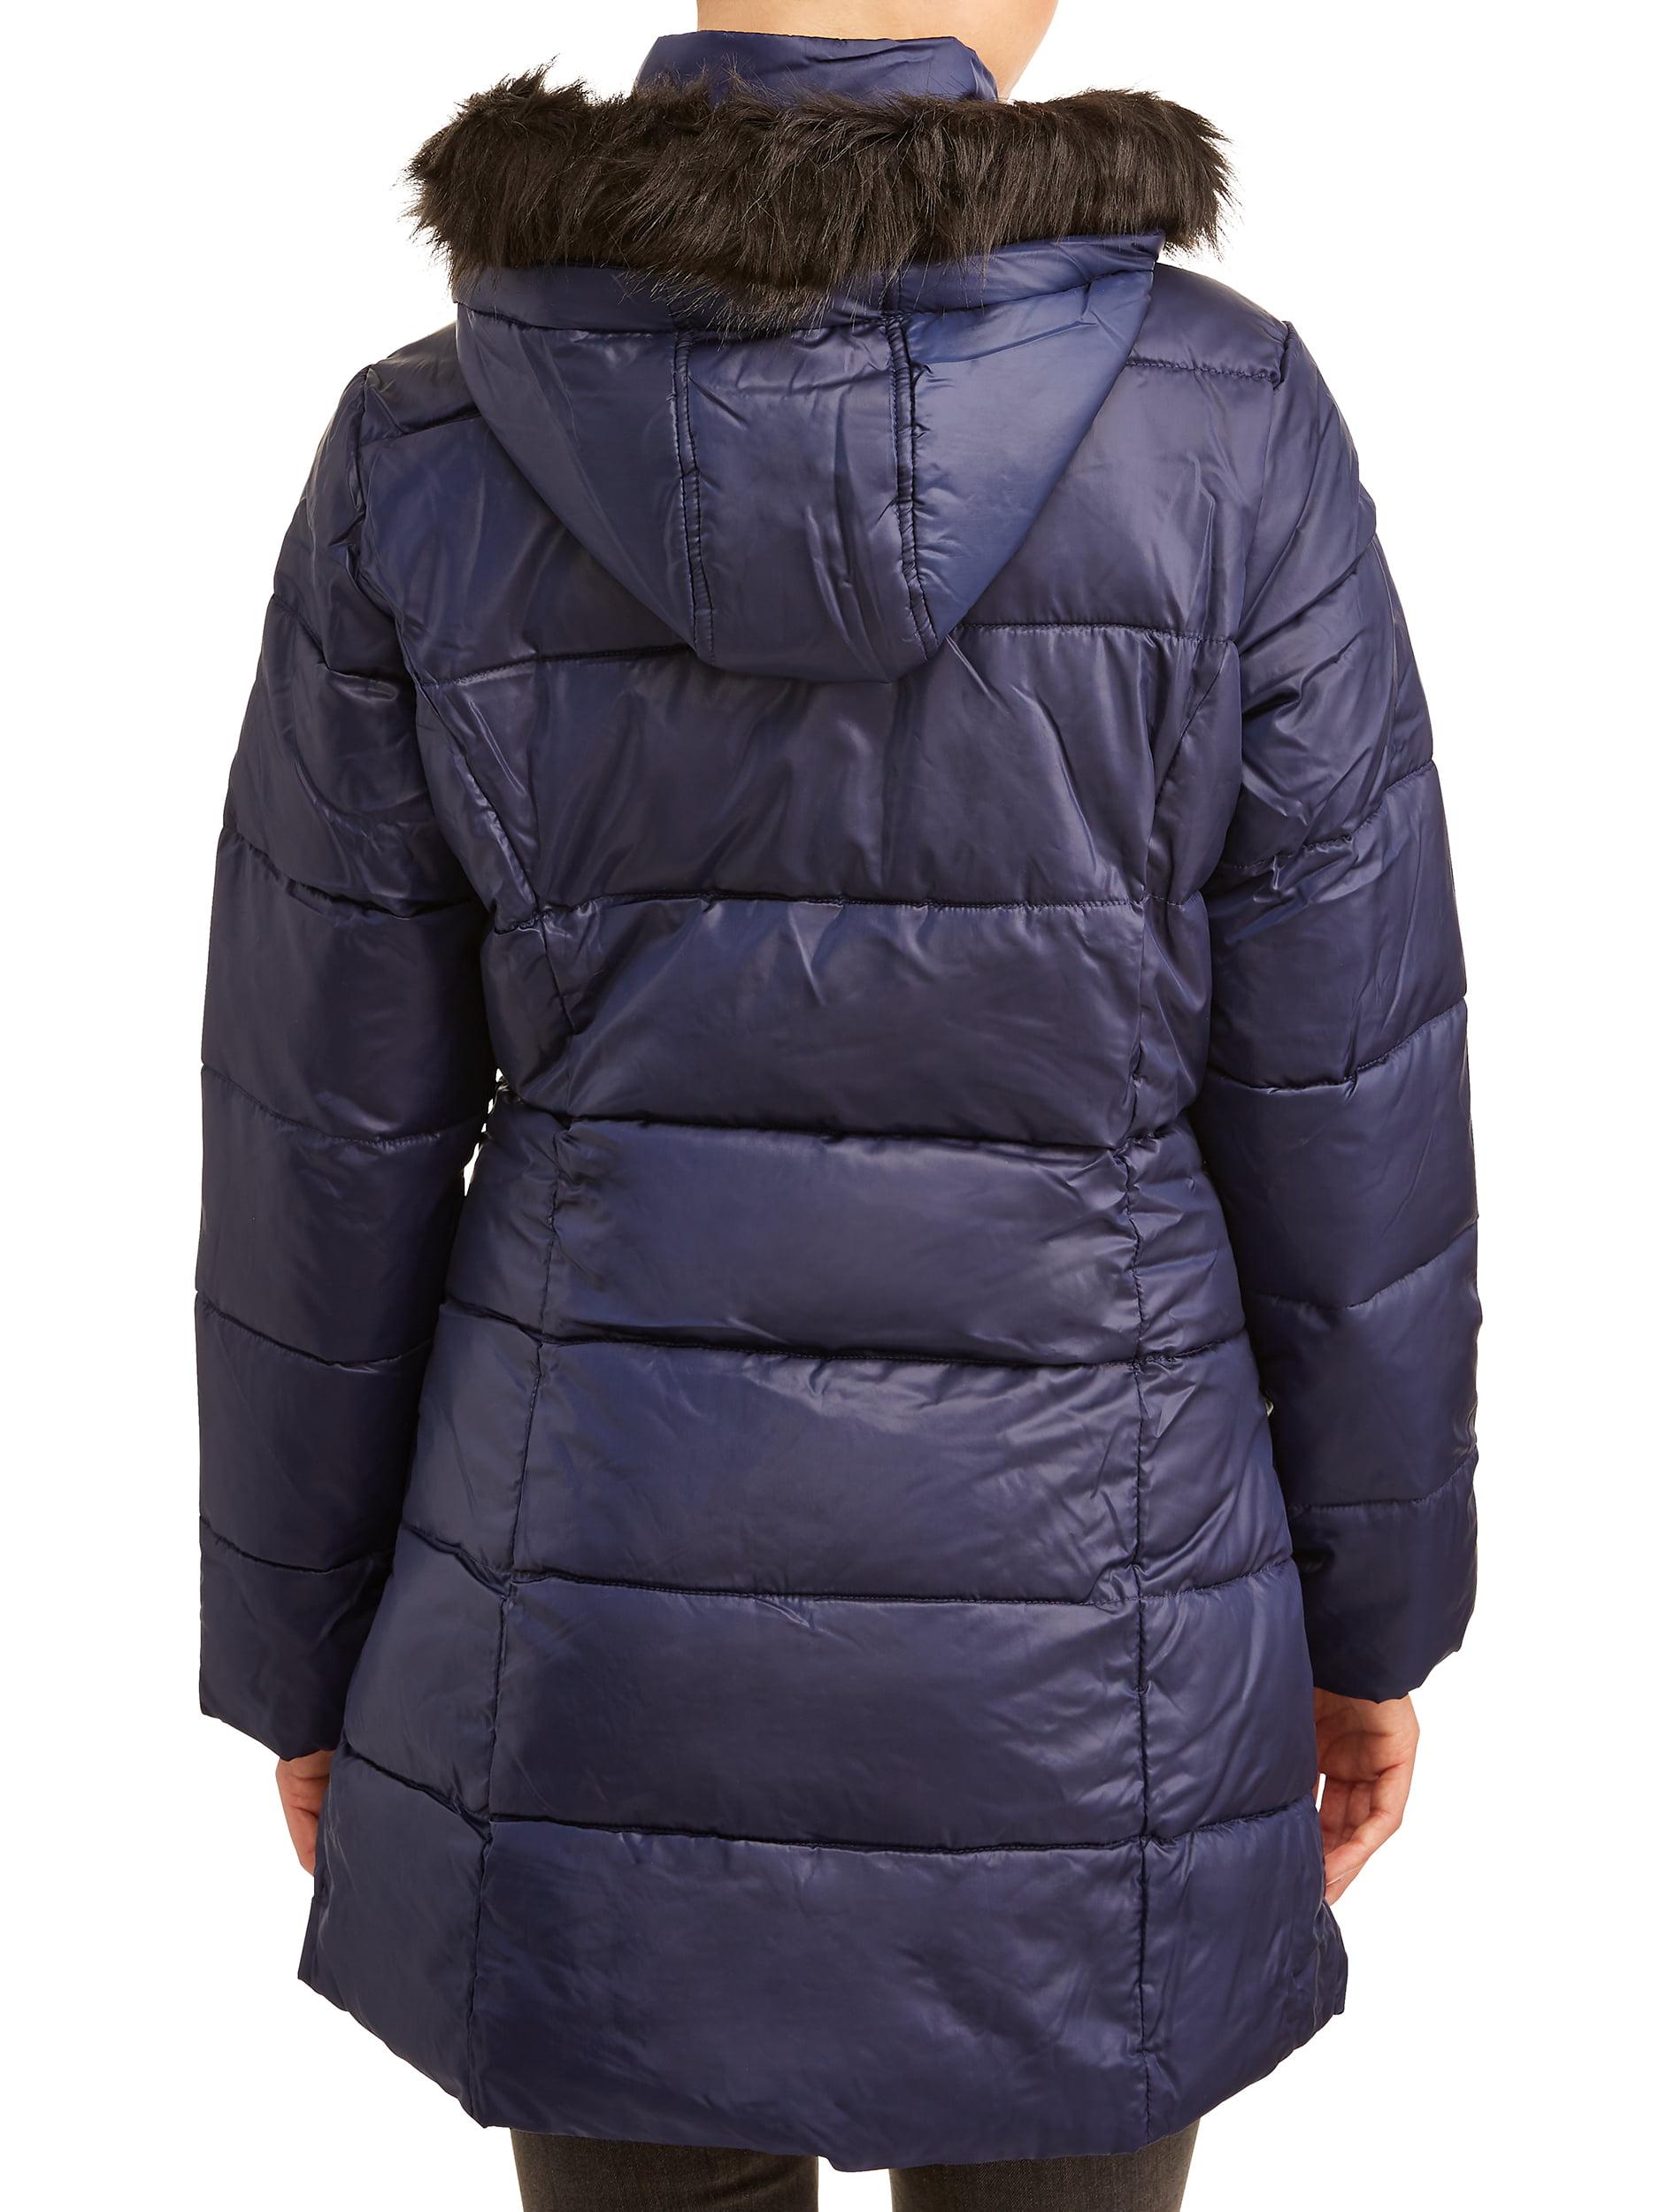 Street Essentials Girls Black Detachable Hood School Coat Smart Anorak Parka Jacket Sizes from 7 to 13 Years